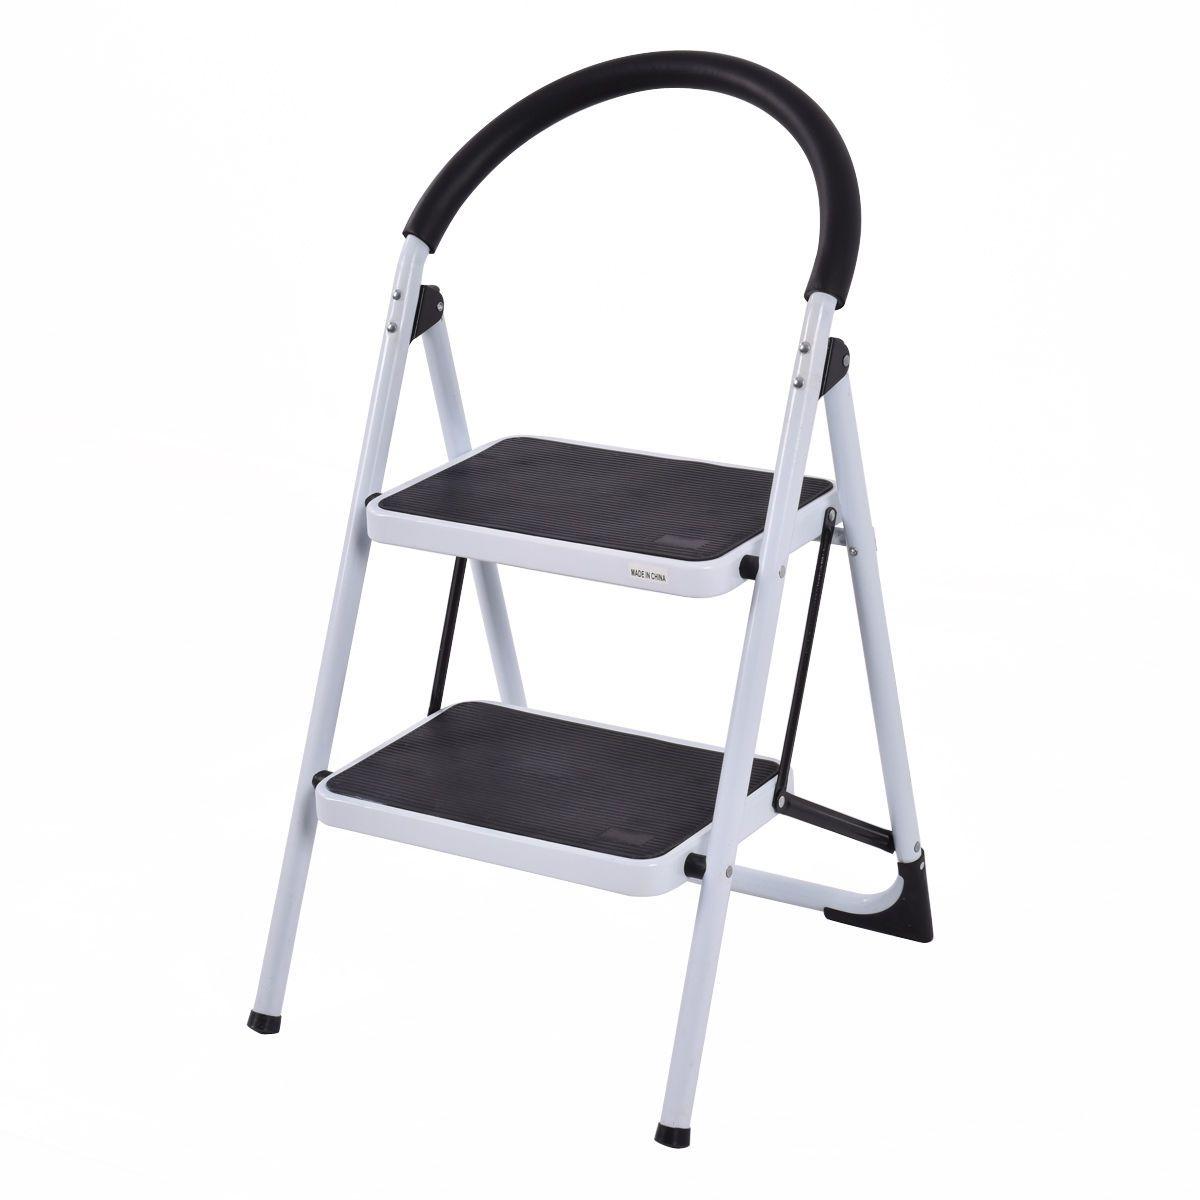 Folding Stool Heavy Duty Industrial Lightweight 2 Step Ladder Folding Stool Step Ladders Kitchen Stools Diy